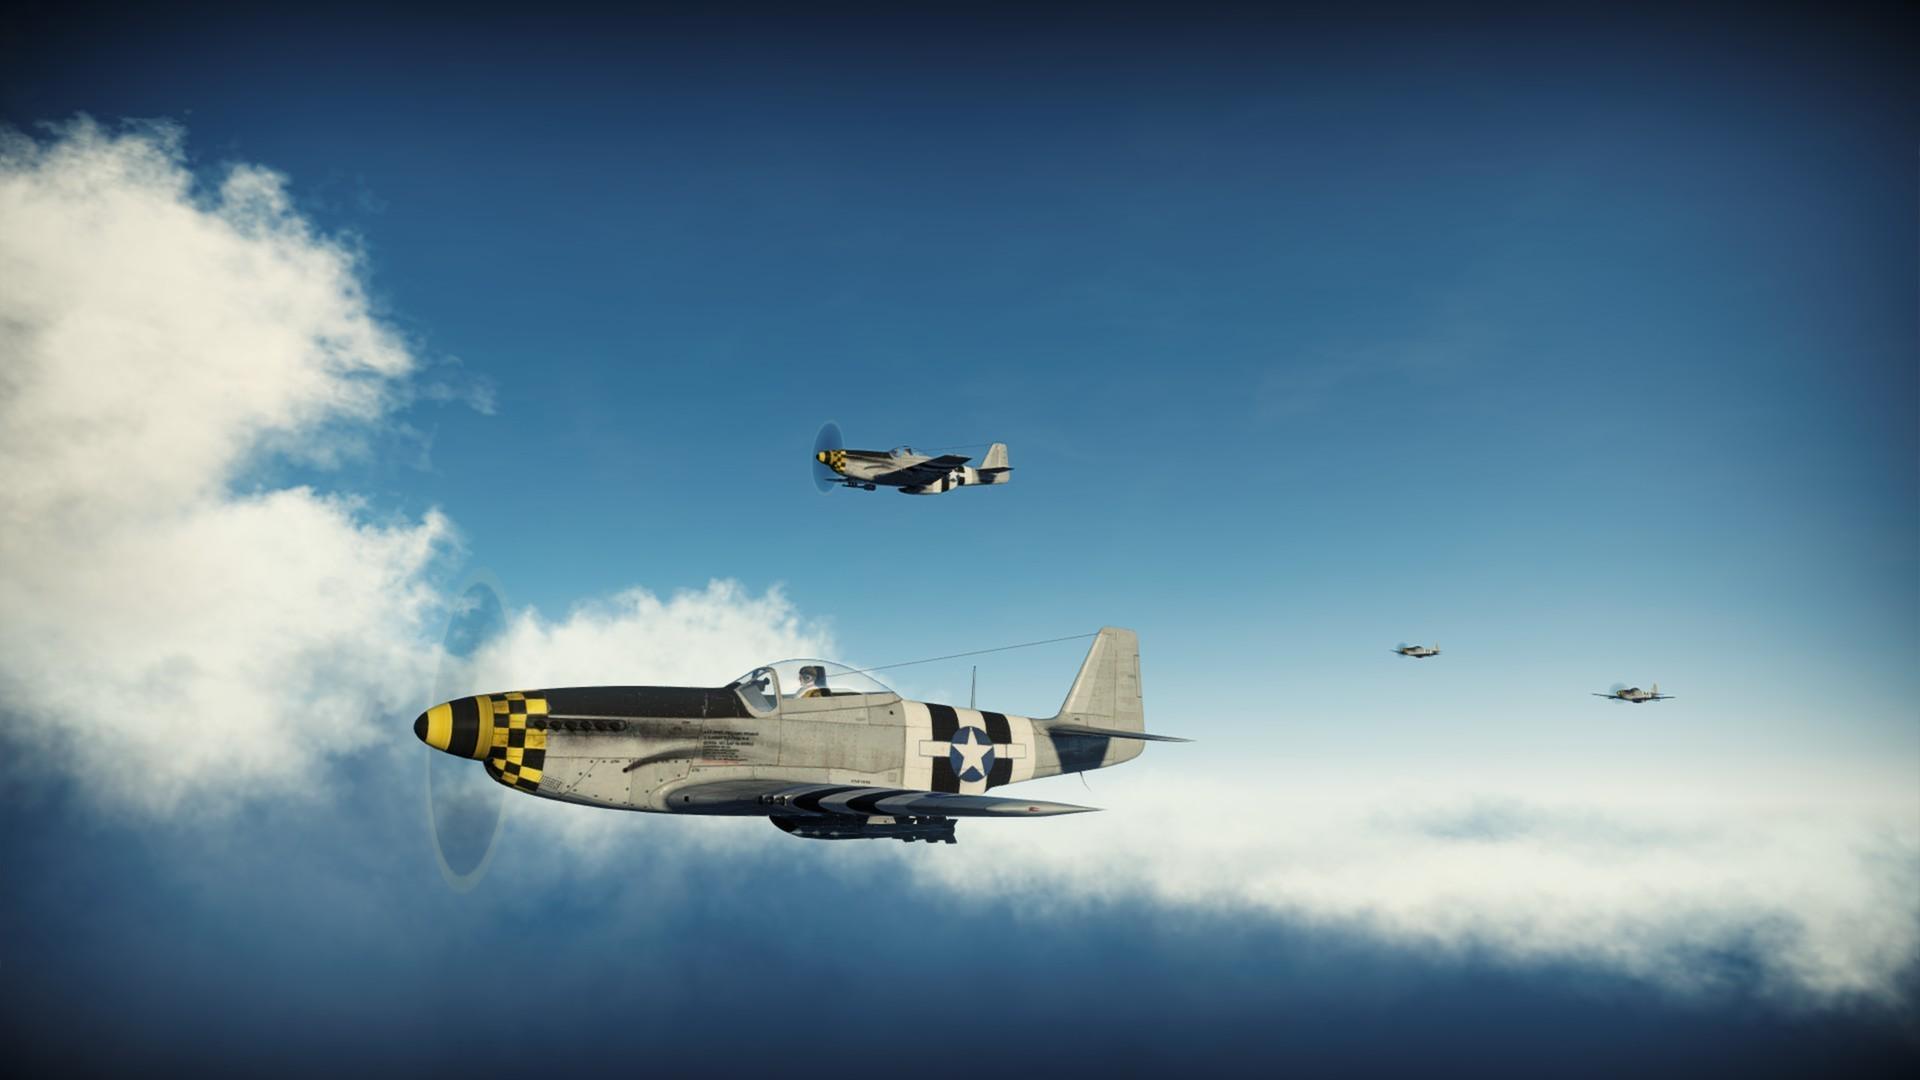 Is war thunder cross platform